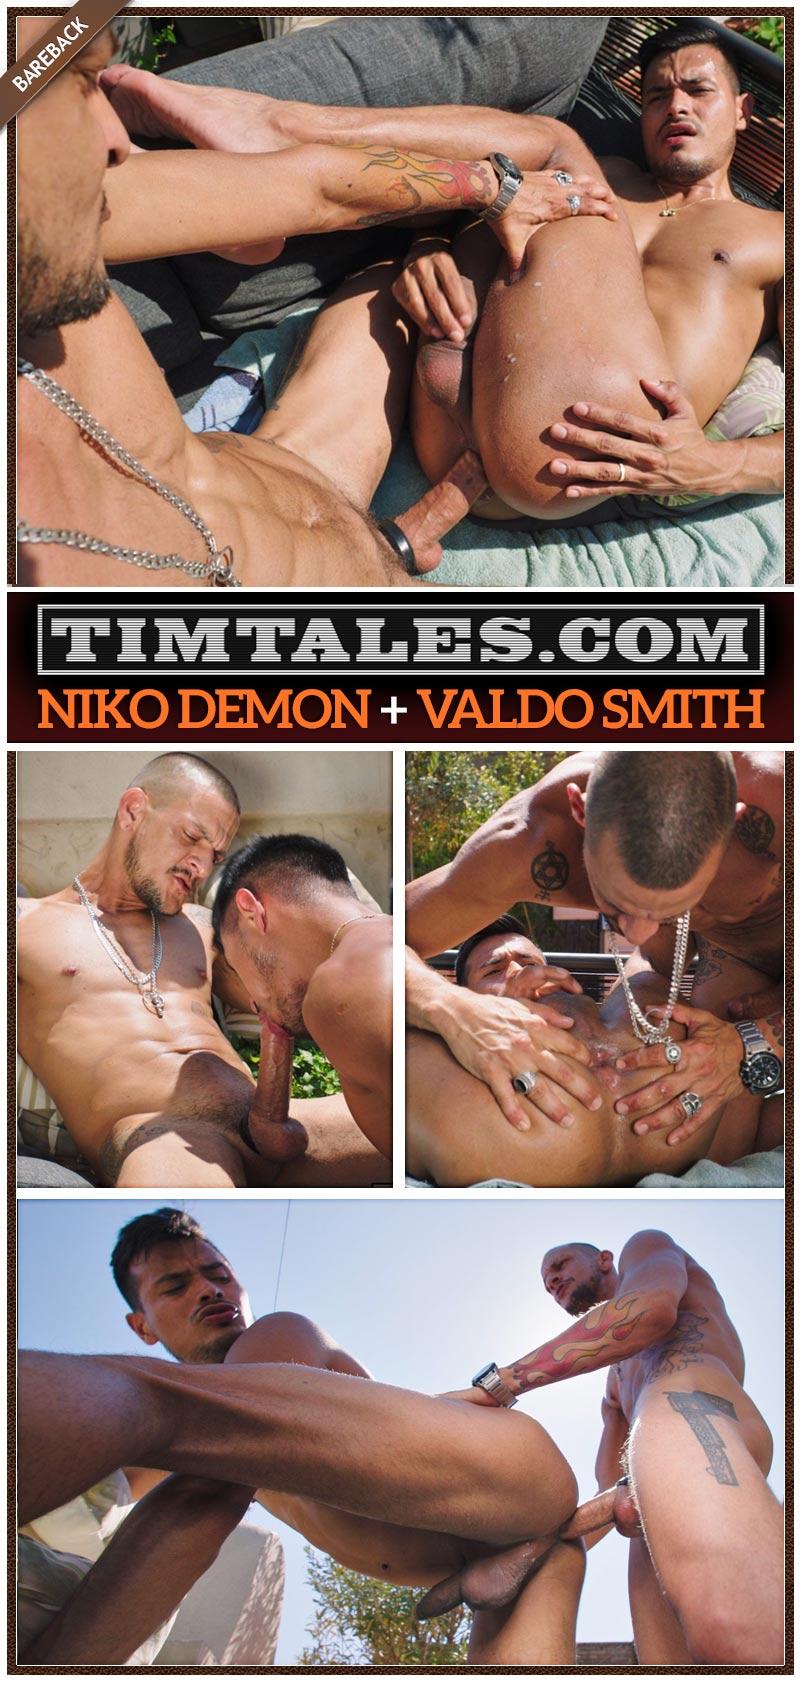 Niko Demon Fucks Valdo Smith at TimTales